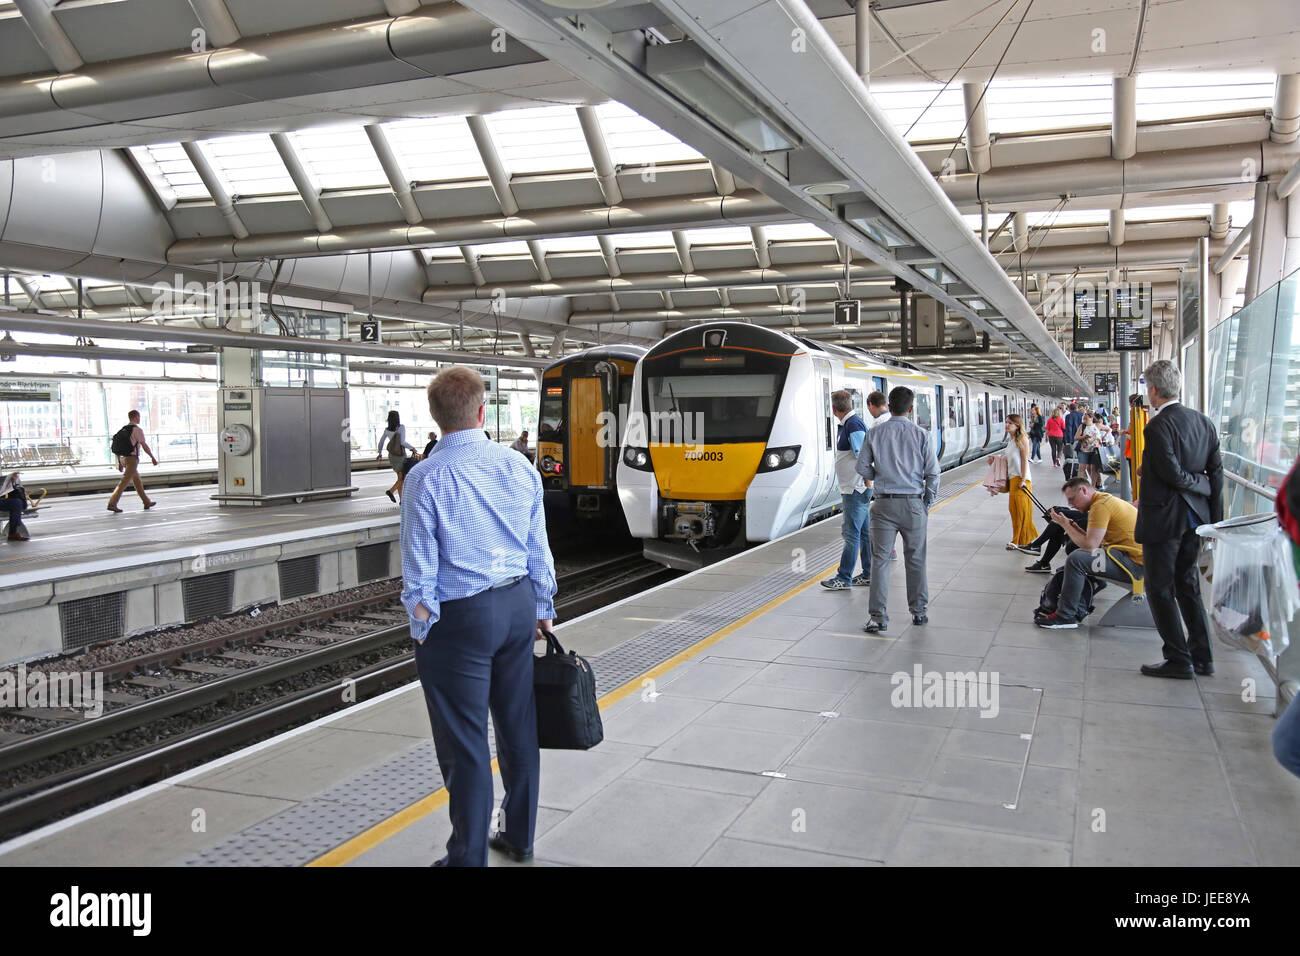 A new generation Siemens Series 700 Thameslink train arrives at Blackfriars Station, London, UK, a key station on - Stock Image